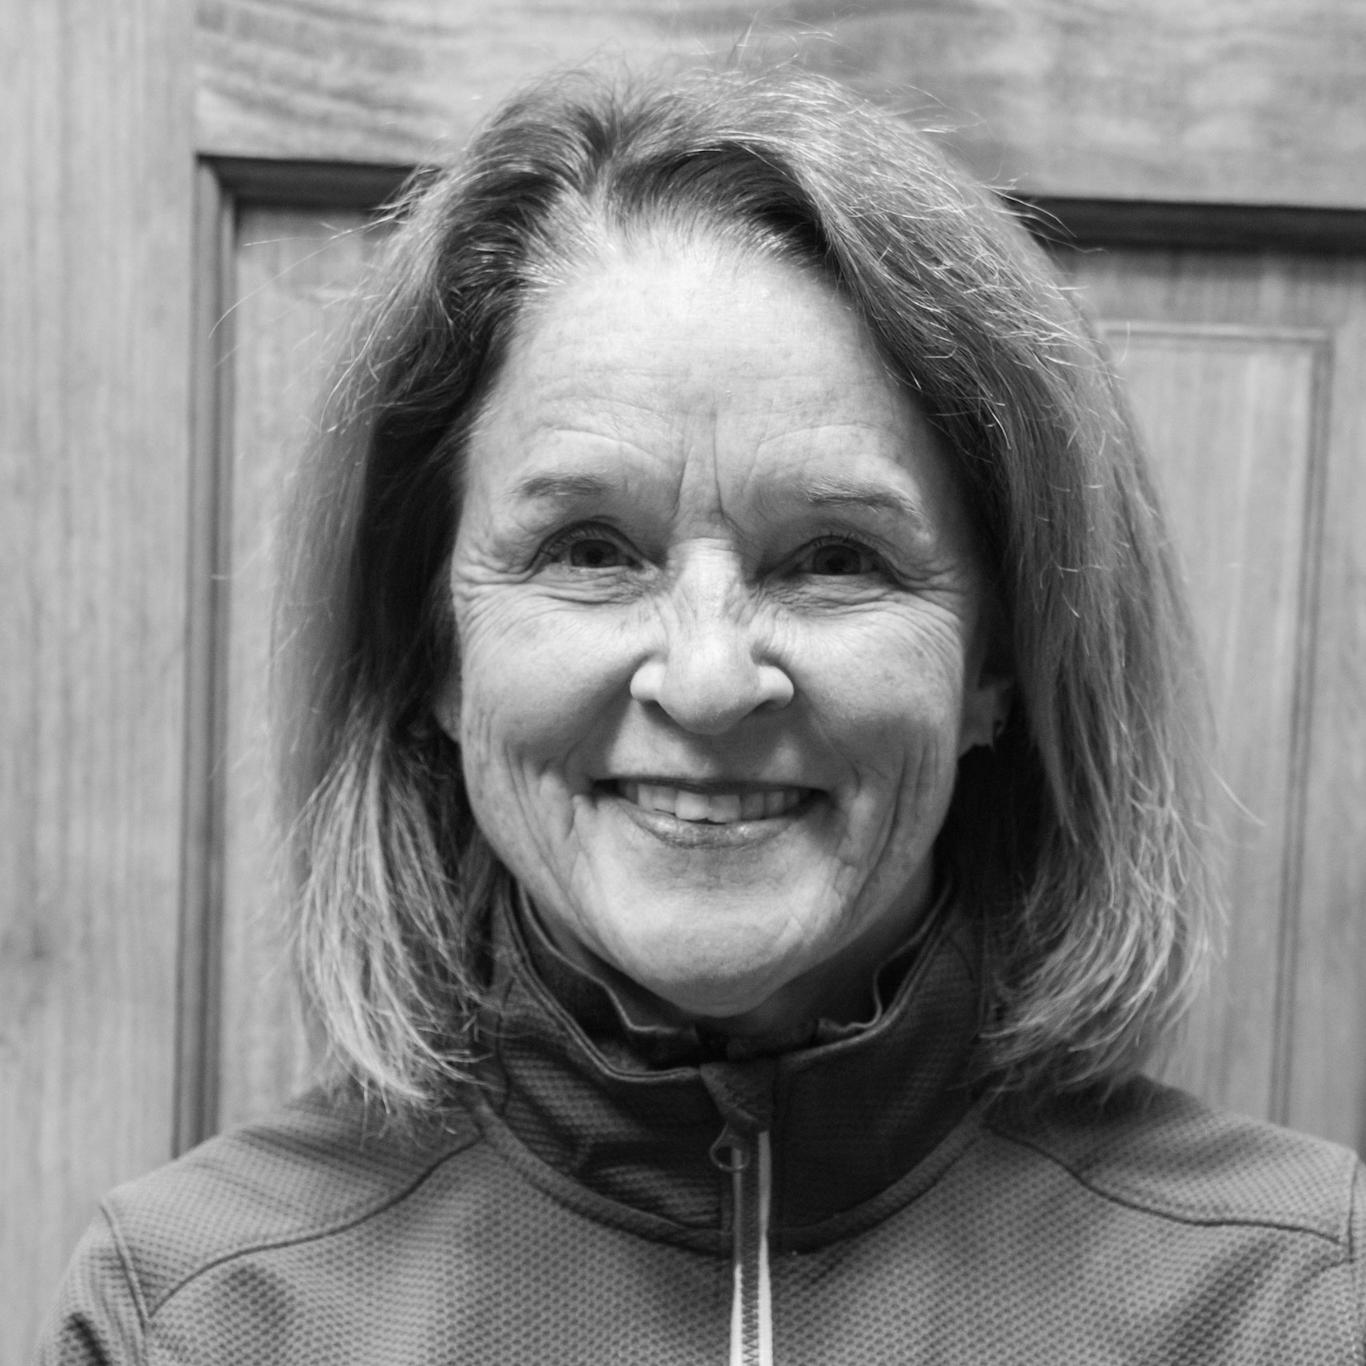 Margie Fiedler